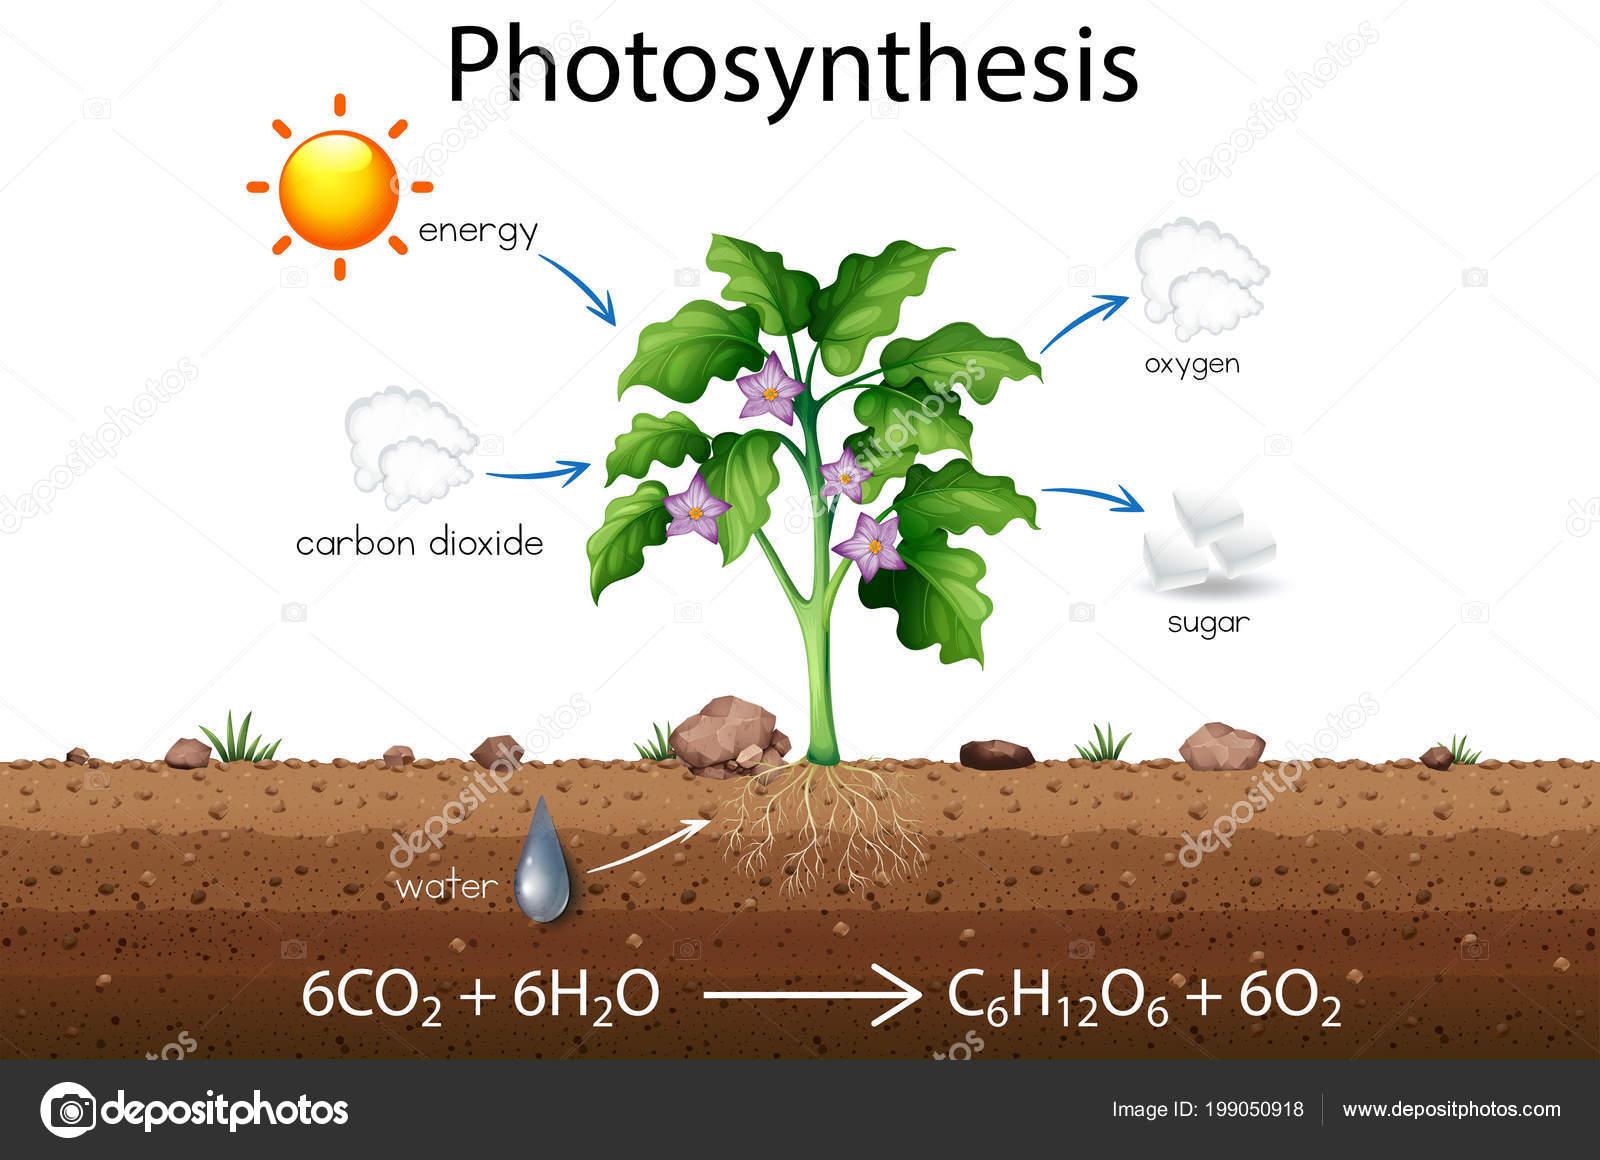 Uitgelezene Photosynthesis Explanation Science Diagram Illustration — Stock QQ-33